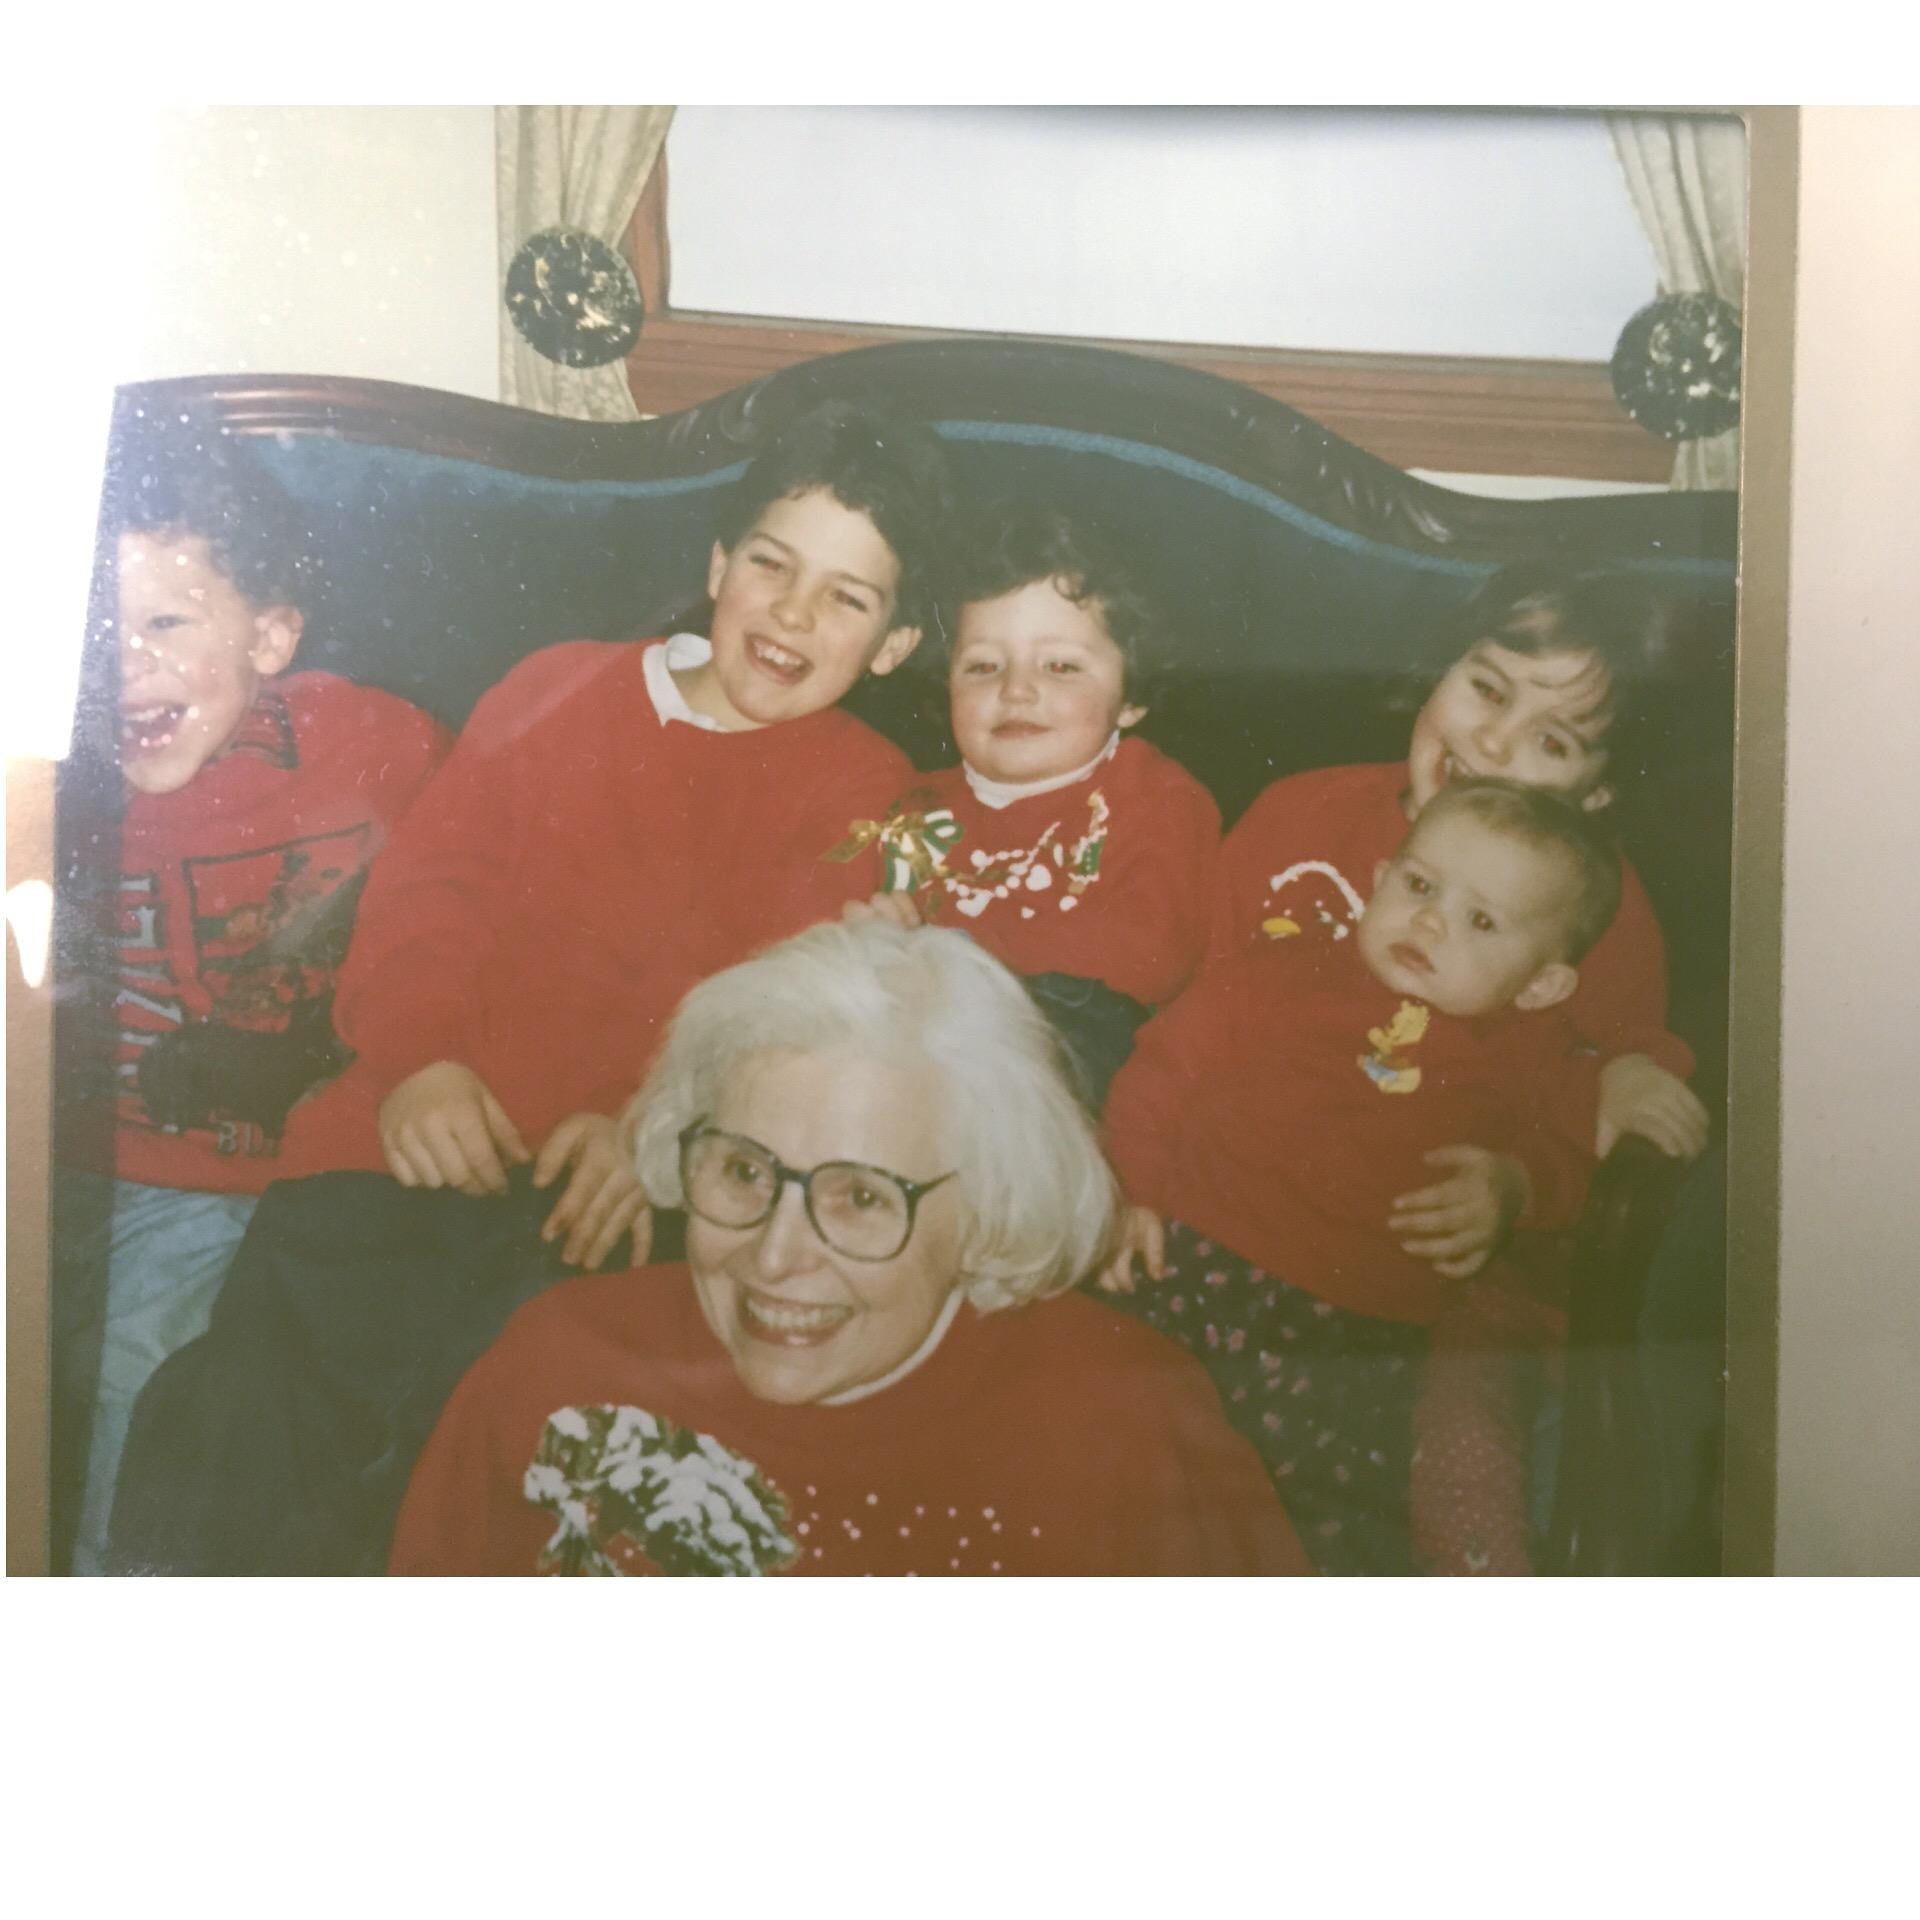 Grandma ChristmasJPG.JPG